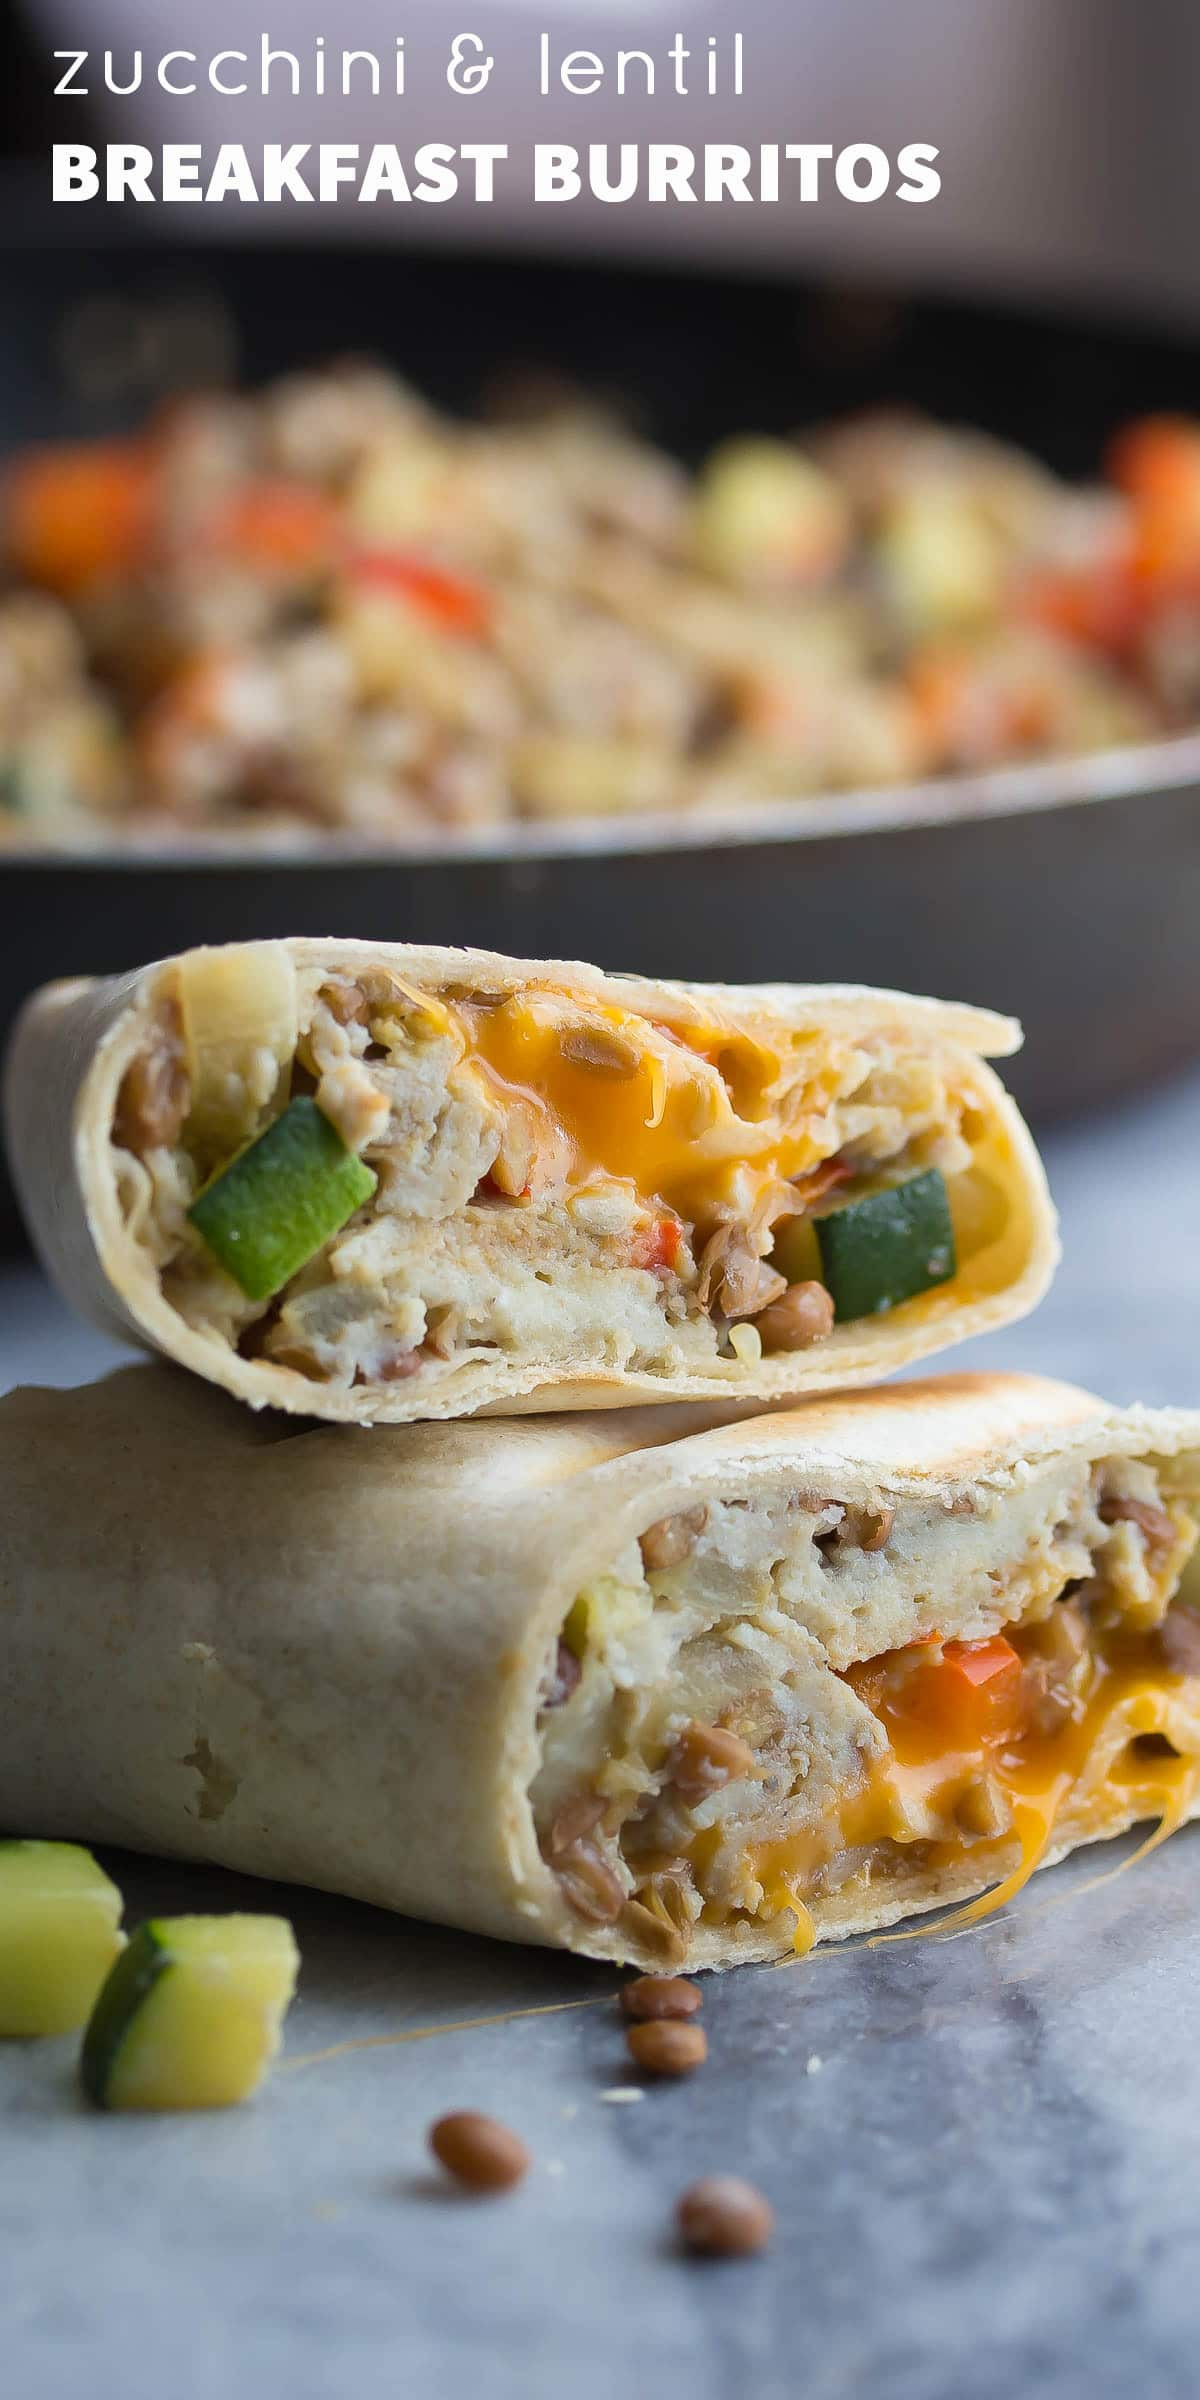 Healthy Breakfast Burritos  Healthy Breakfast Burritos with Zucchini and Lentils